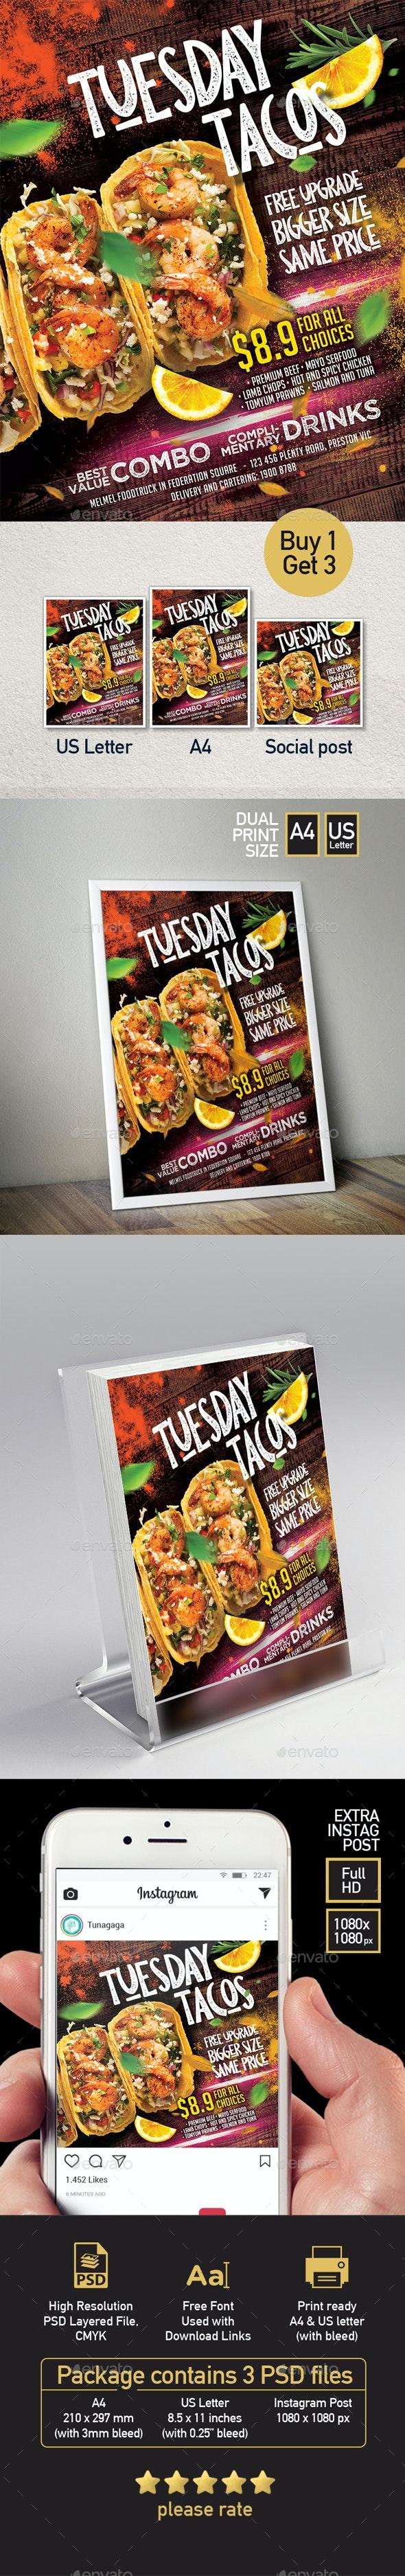 Tacos Mexico Restaurant Flyer - Set of 3 Templates - Restaurant Flyers